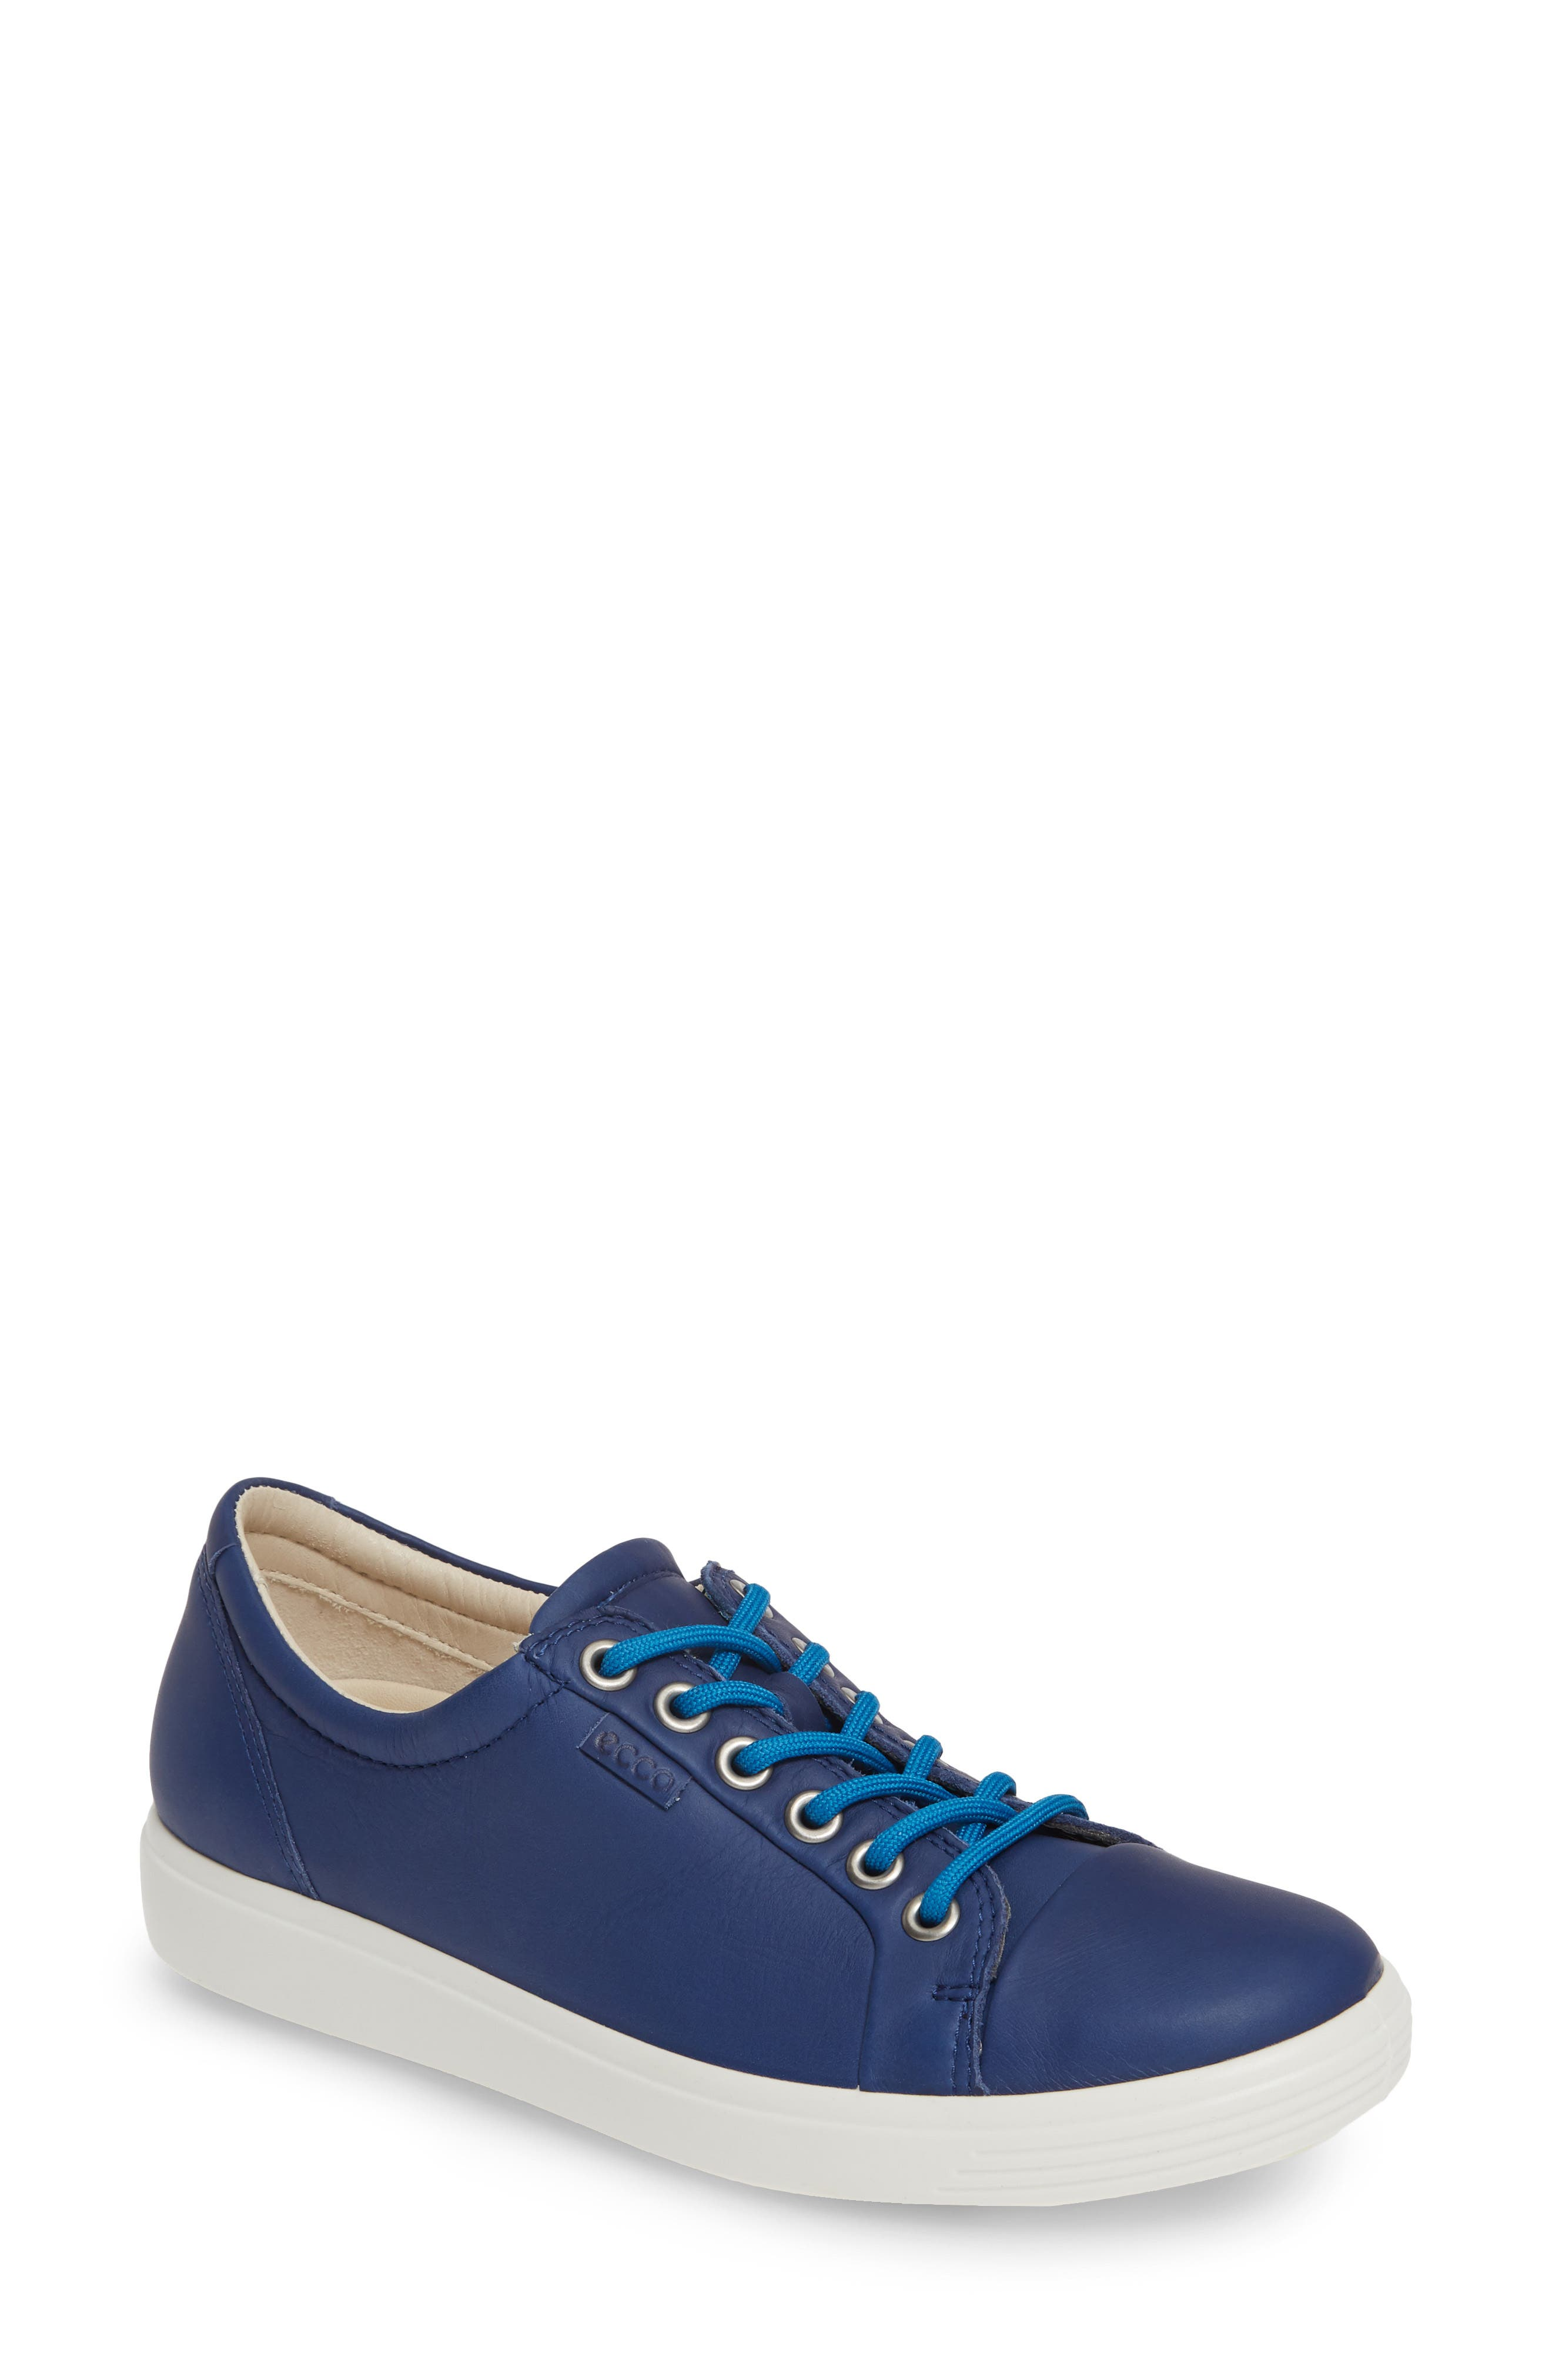 ,                             Soft 7 Sneaker,                             Main thumbnail 86, color,                             402